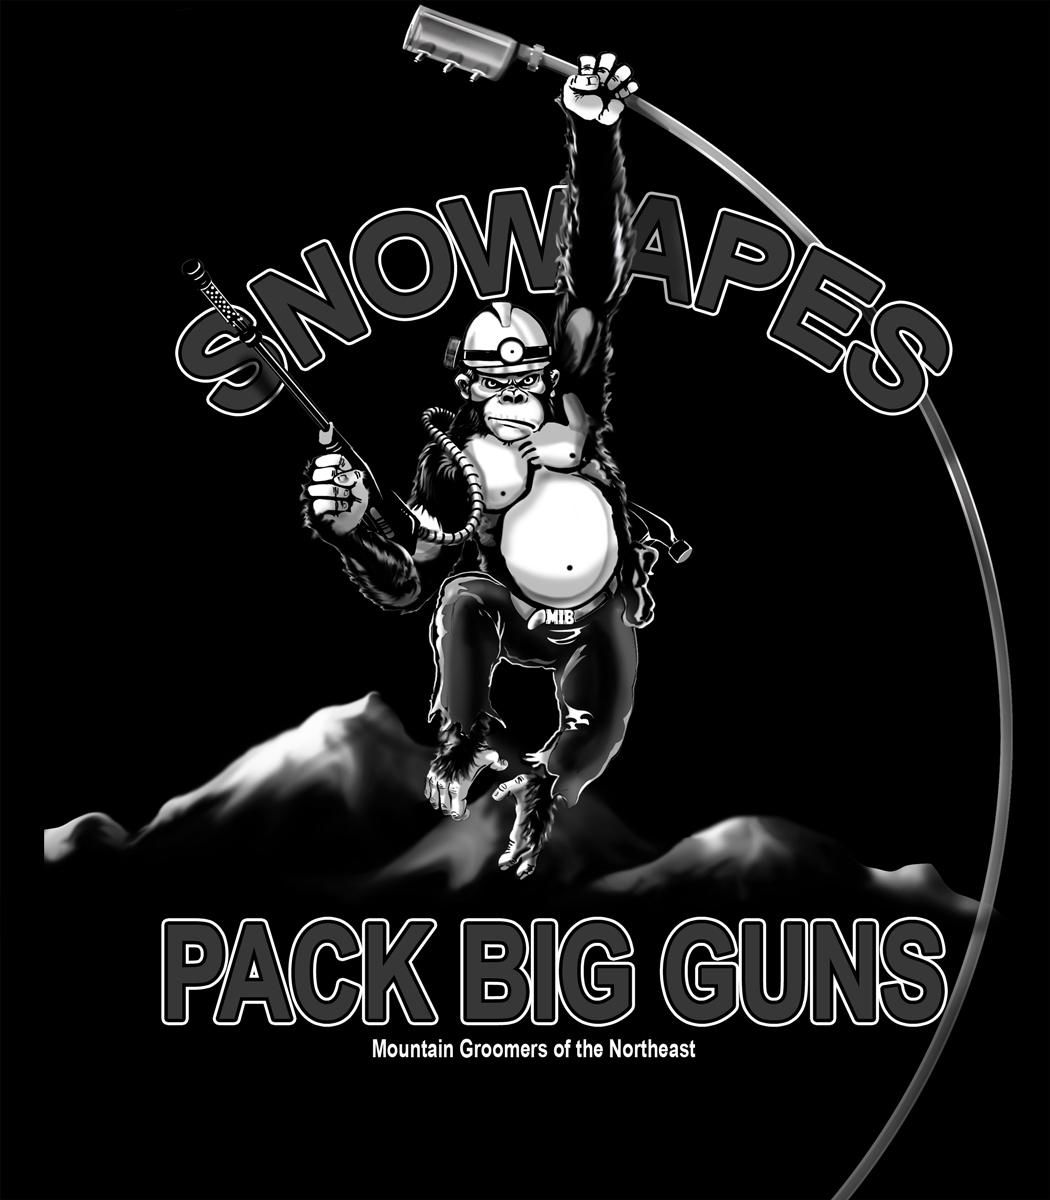 Snowape3